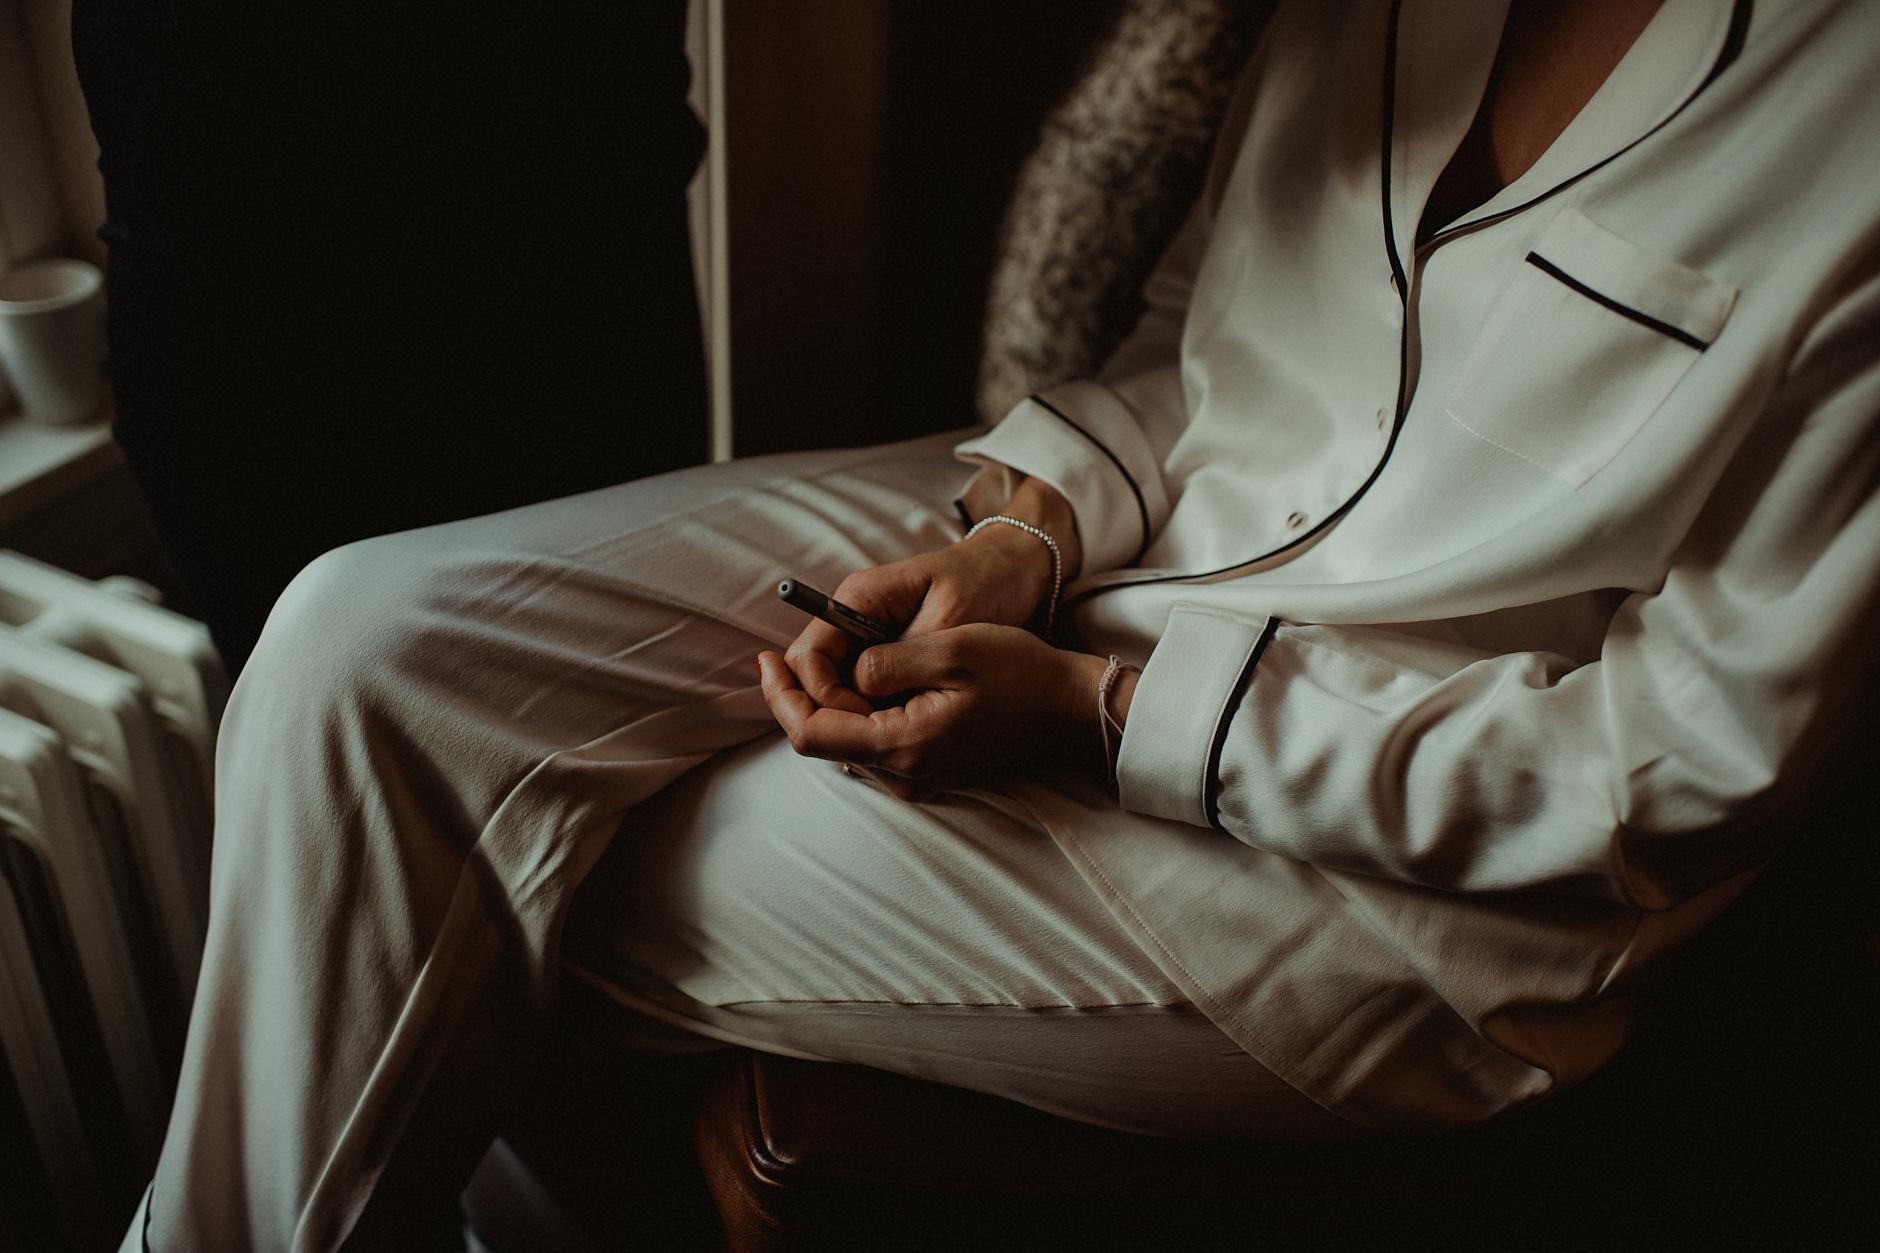 Glentruim-Wedding-Nikki-Leadbetter-Photography-5.jpg